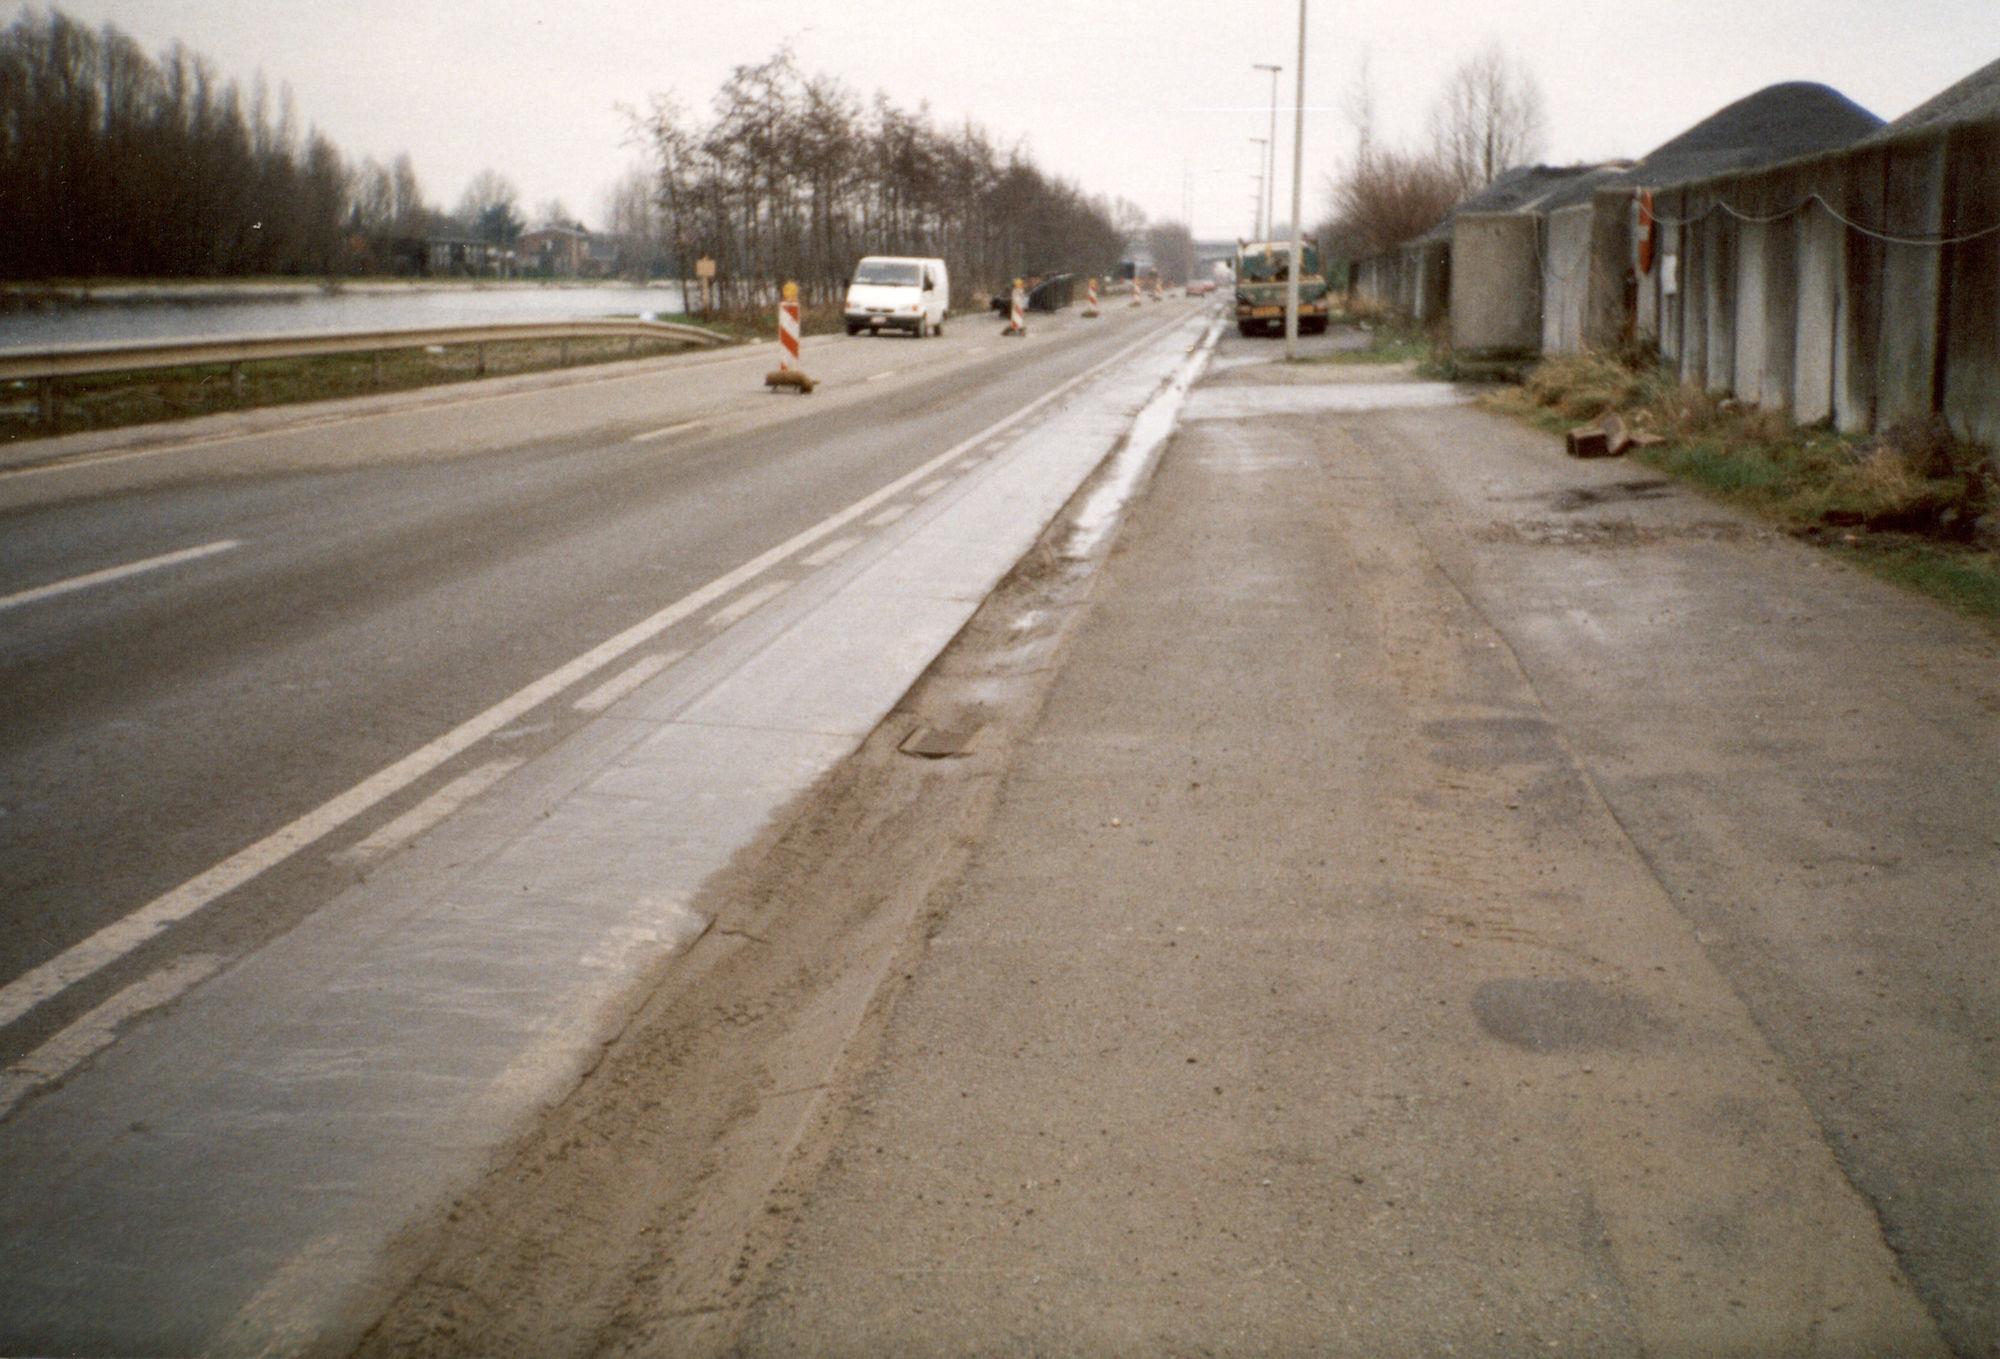 Loskaaien in de Kanaalstraat langs het kanaal Bossuit-Kortrijk in Harelbeke 2000